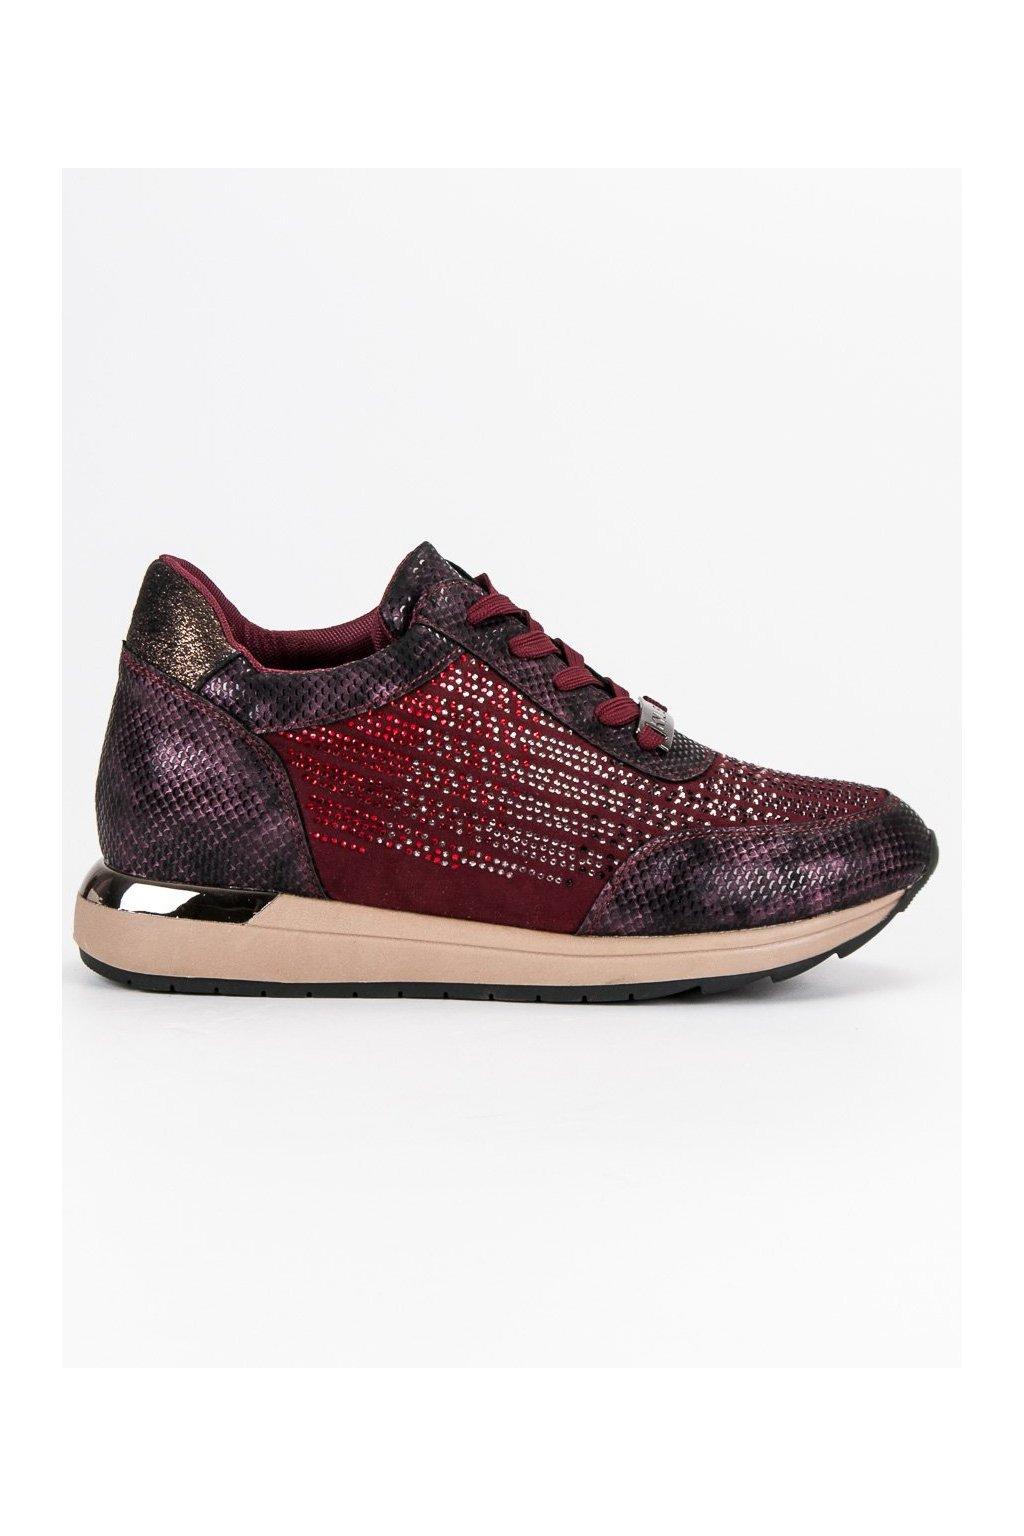 1fdf17ec0e15 1039385-1 modna-sportova-obuv-cervene-tenisky-kylie.jpg 5bca5819